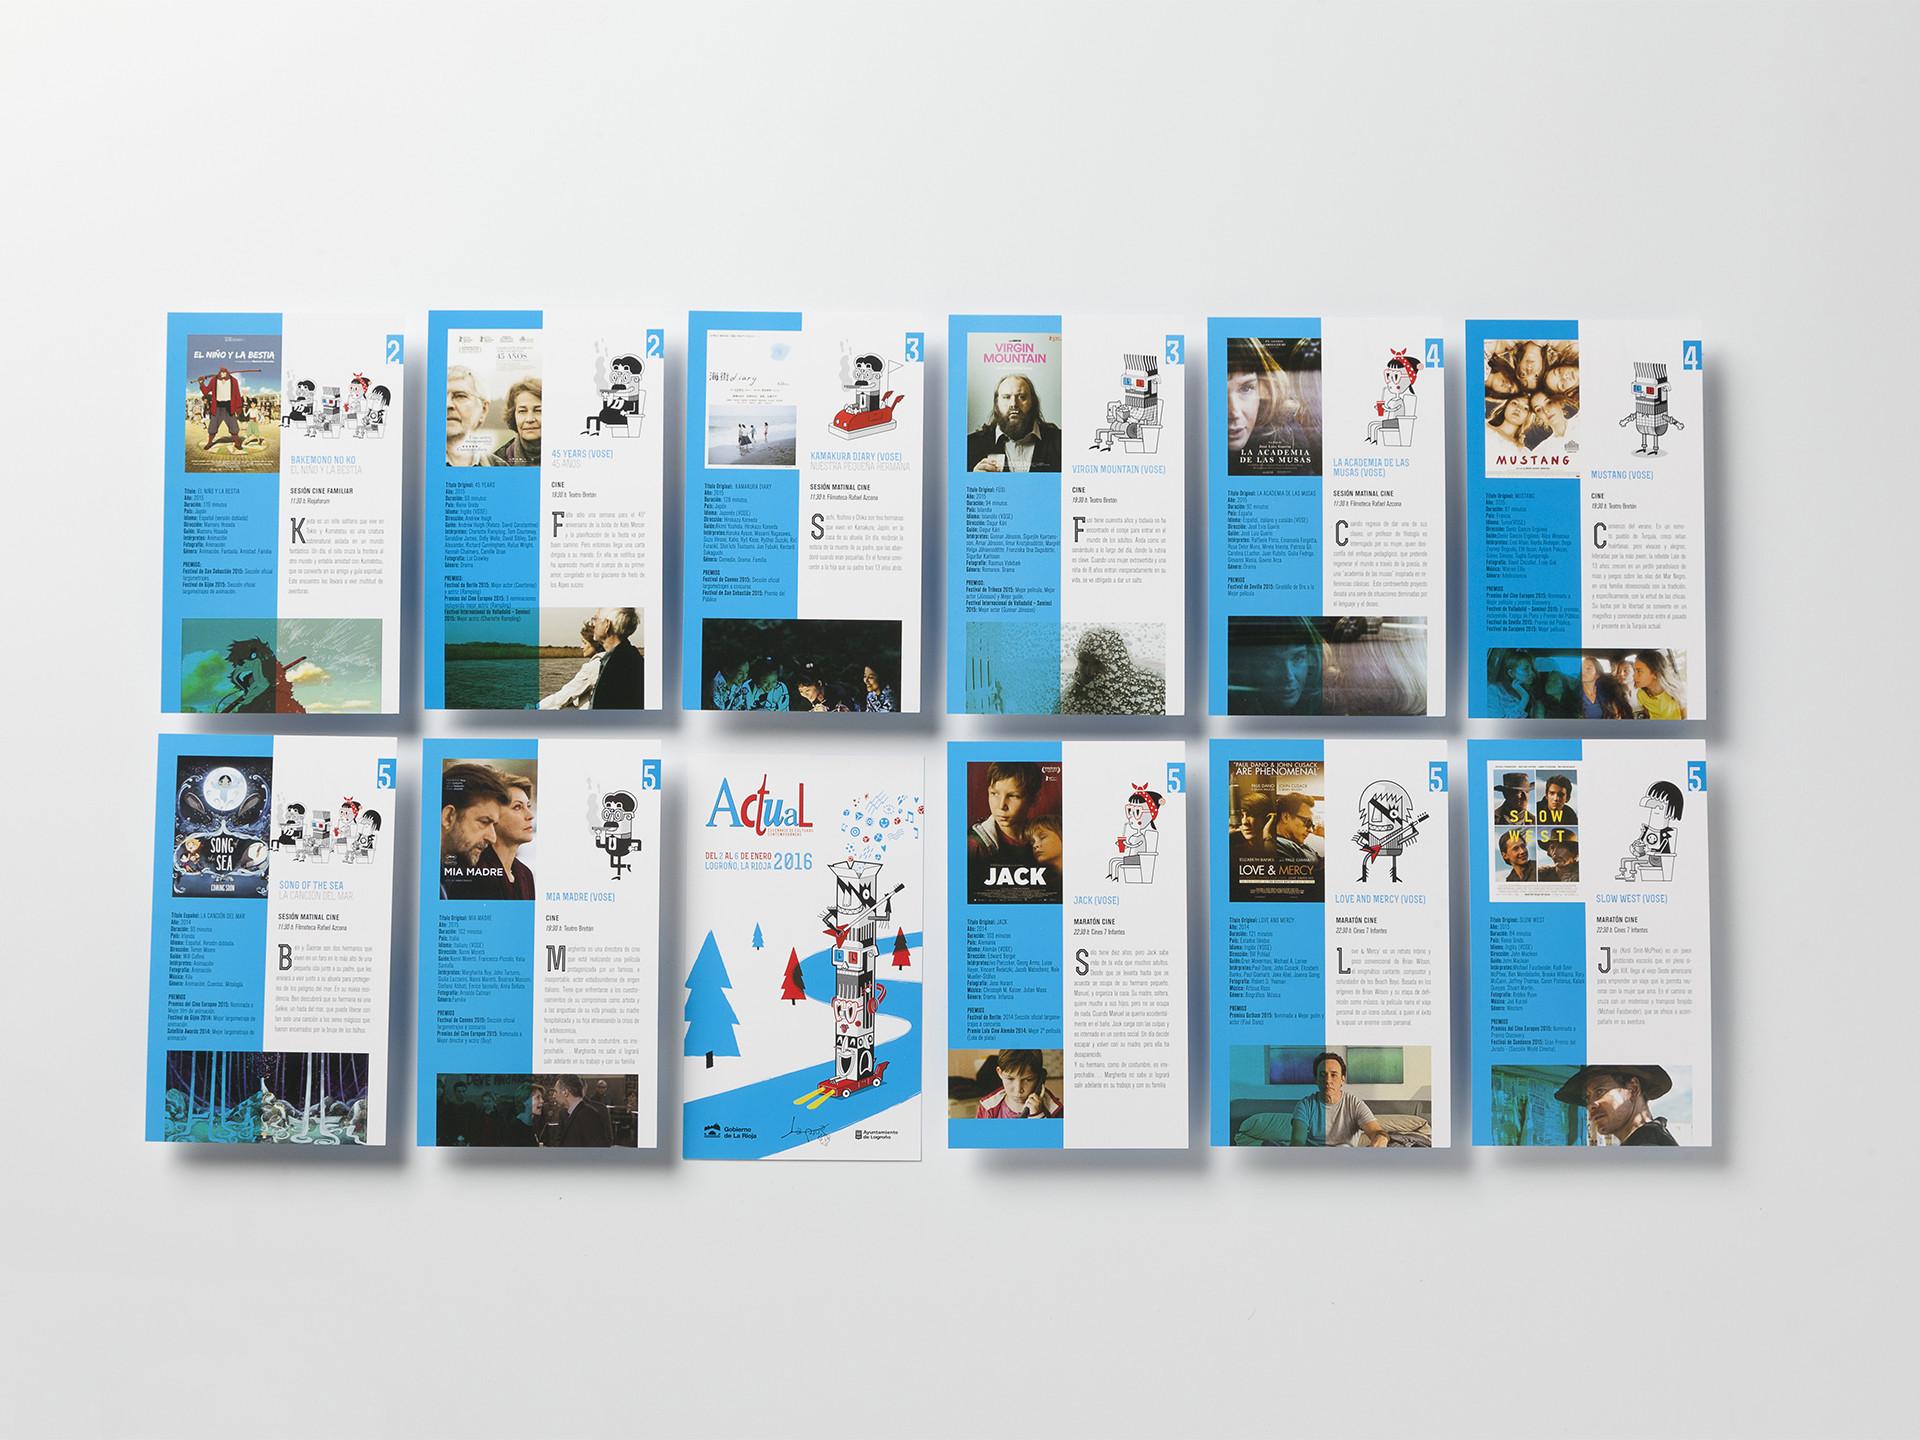 Diseño afiches peliculas Festival Actual 2016